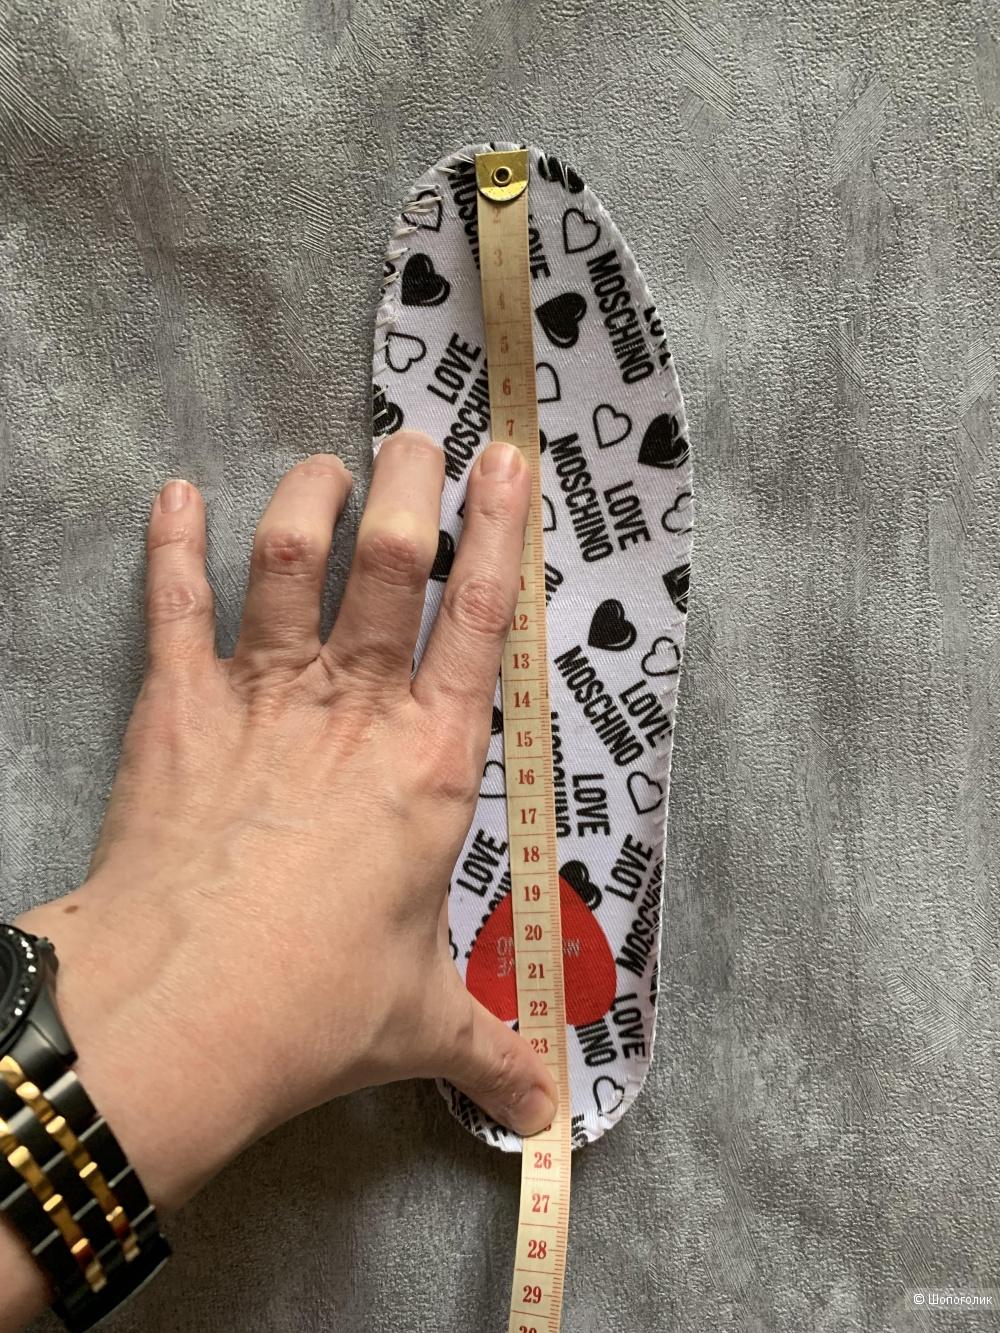 Кроссовки Love Moschino размер 4 uk - 37 eu